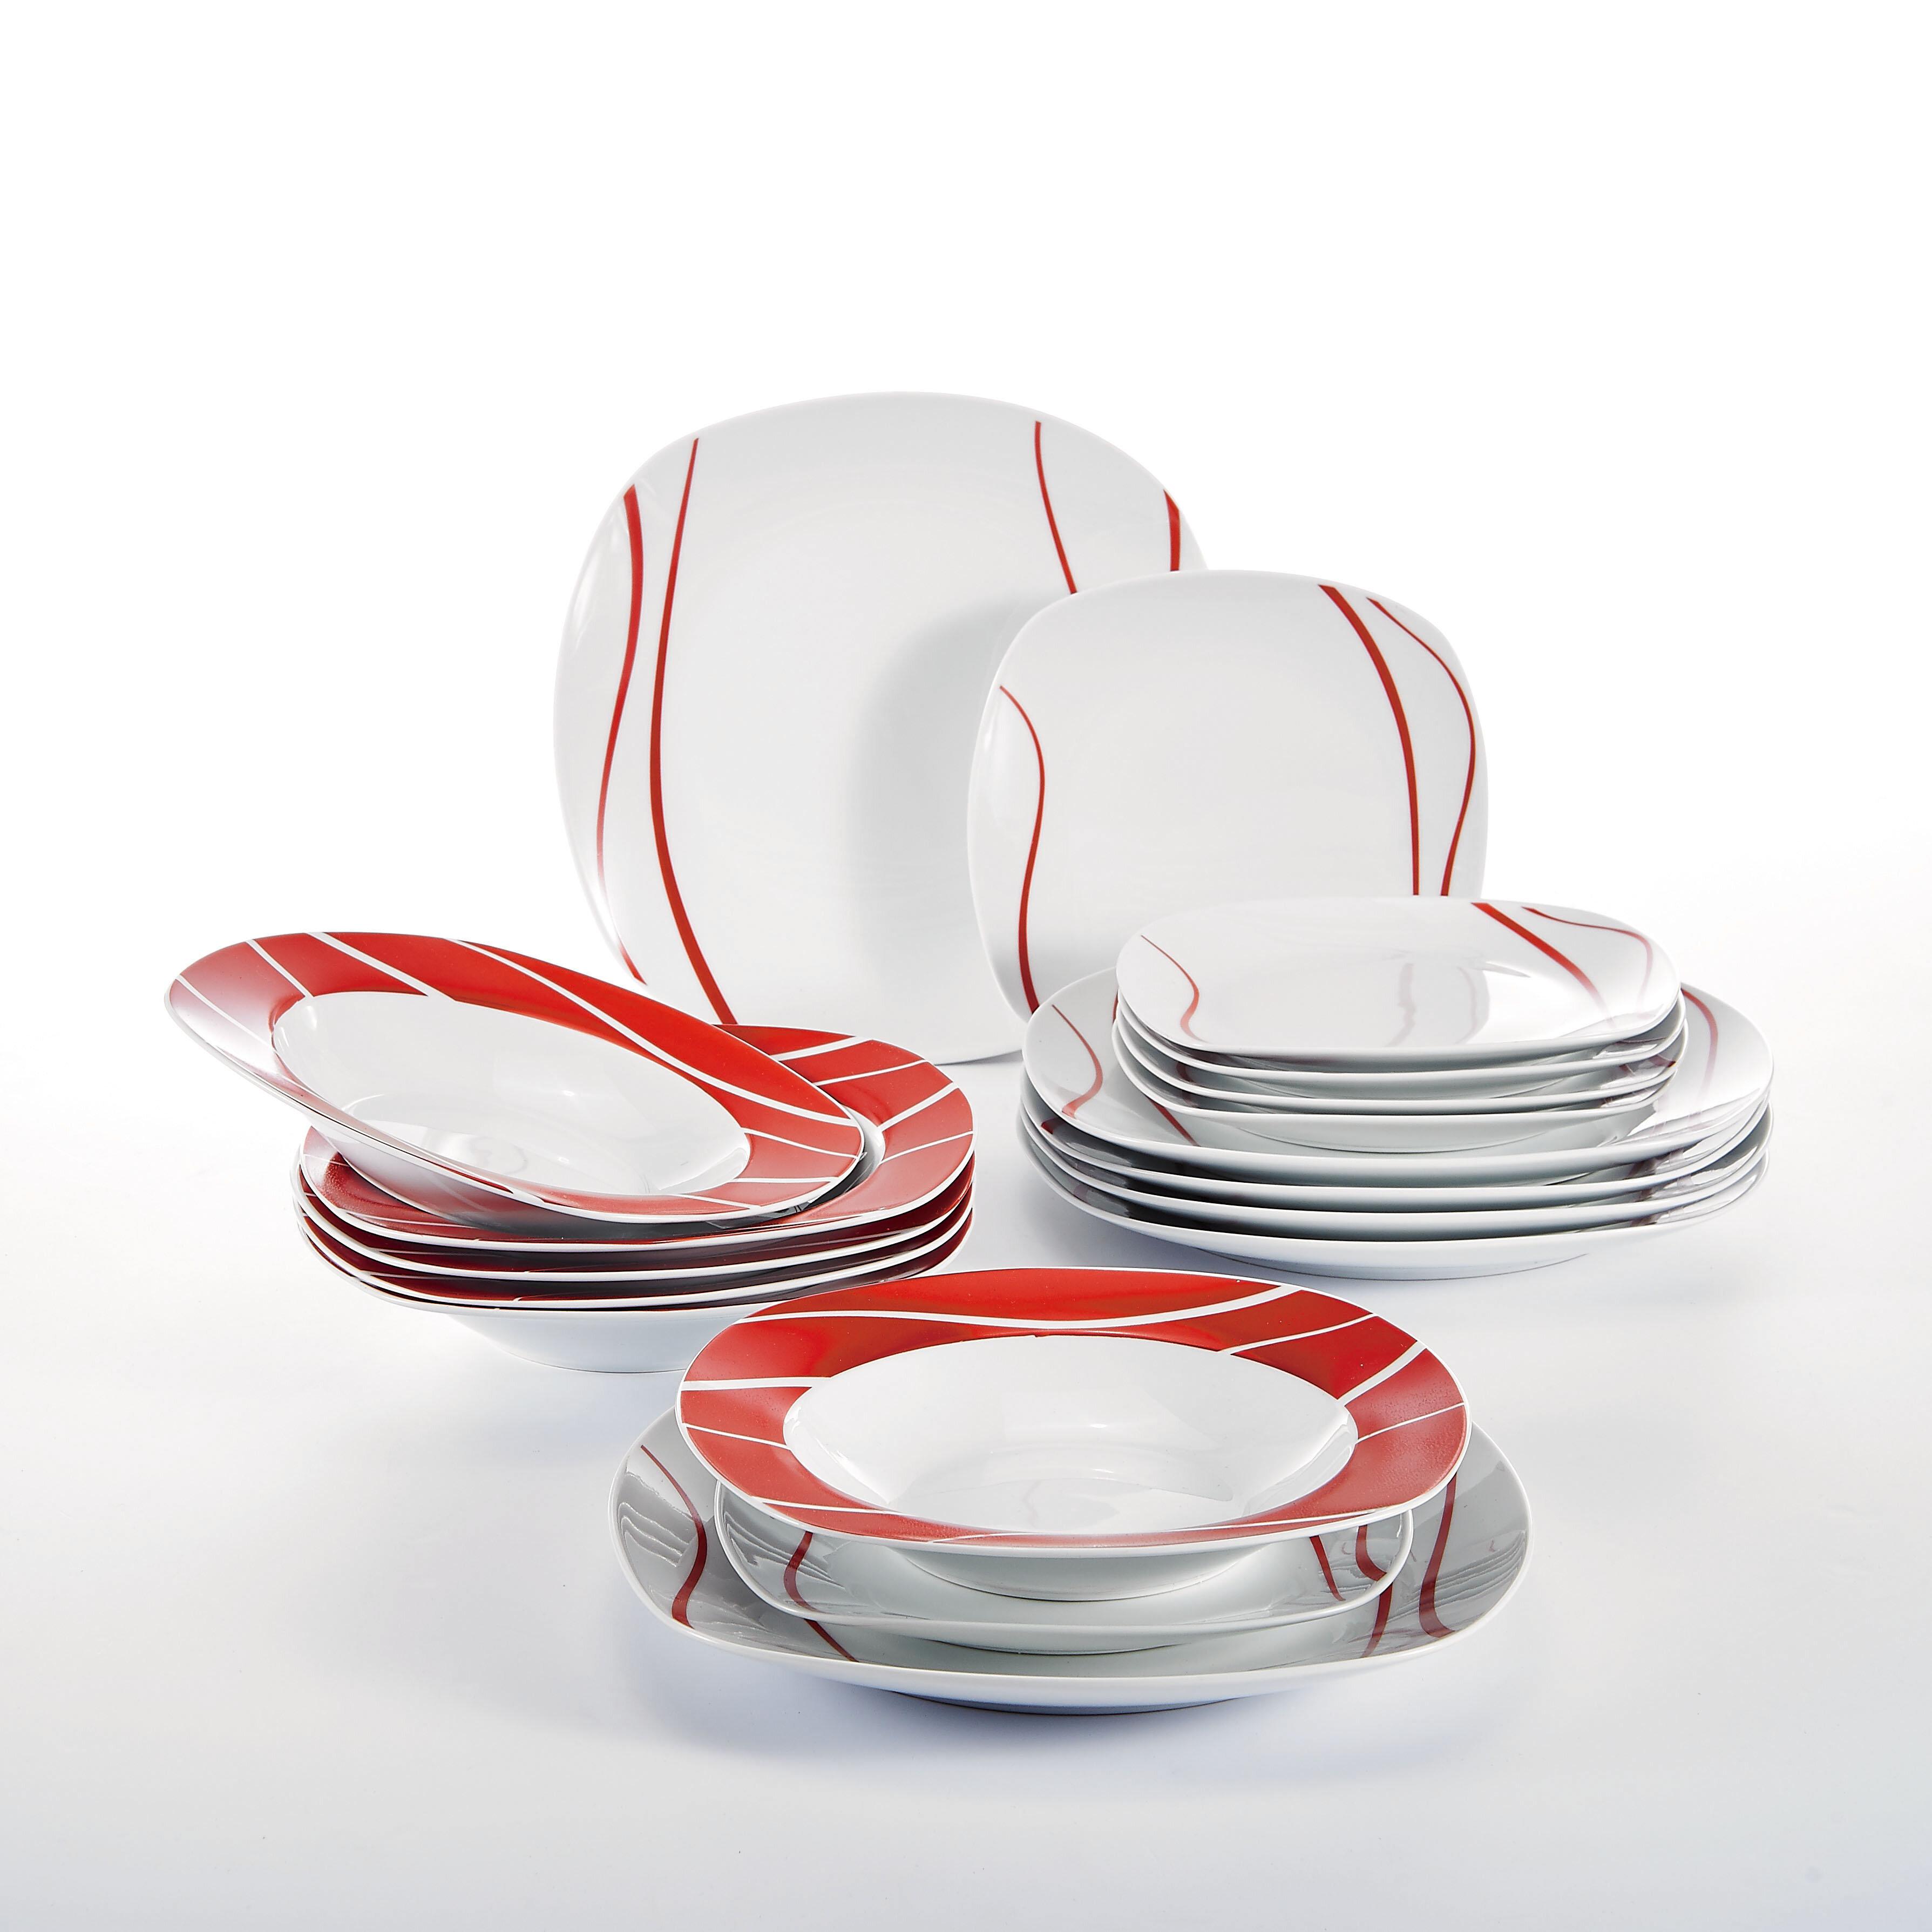 Malacasa Felisa 18 Piece Dinnerware Set Service For 6 Reviews Wayfair